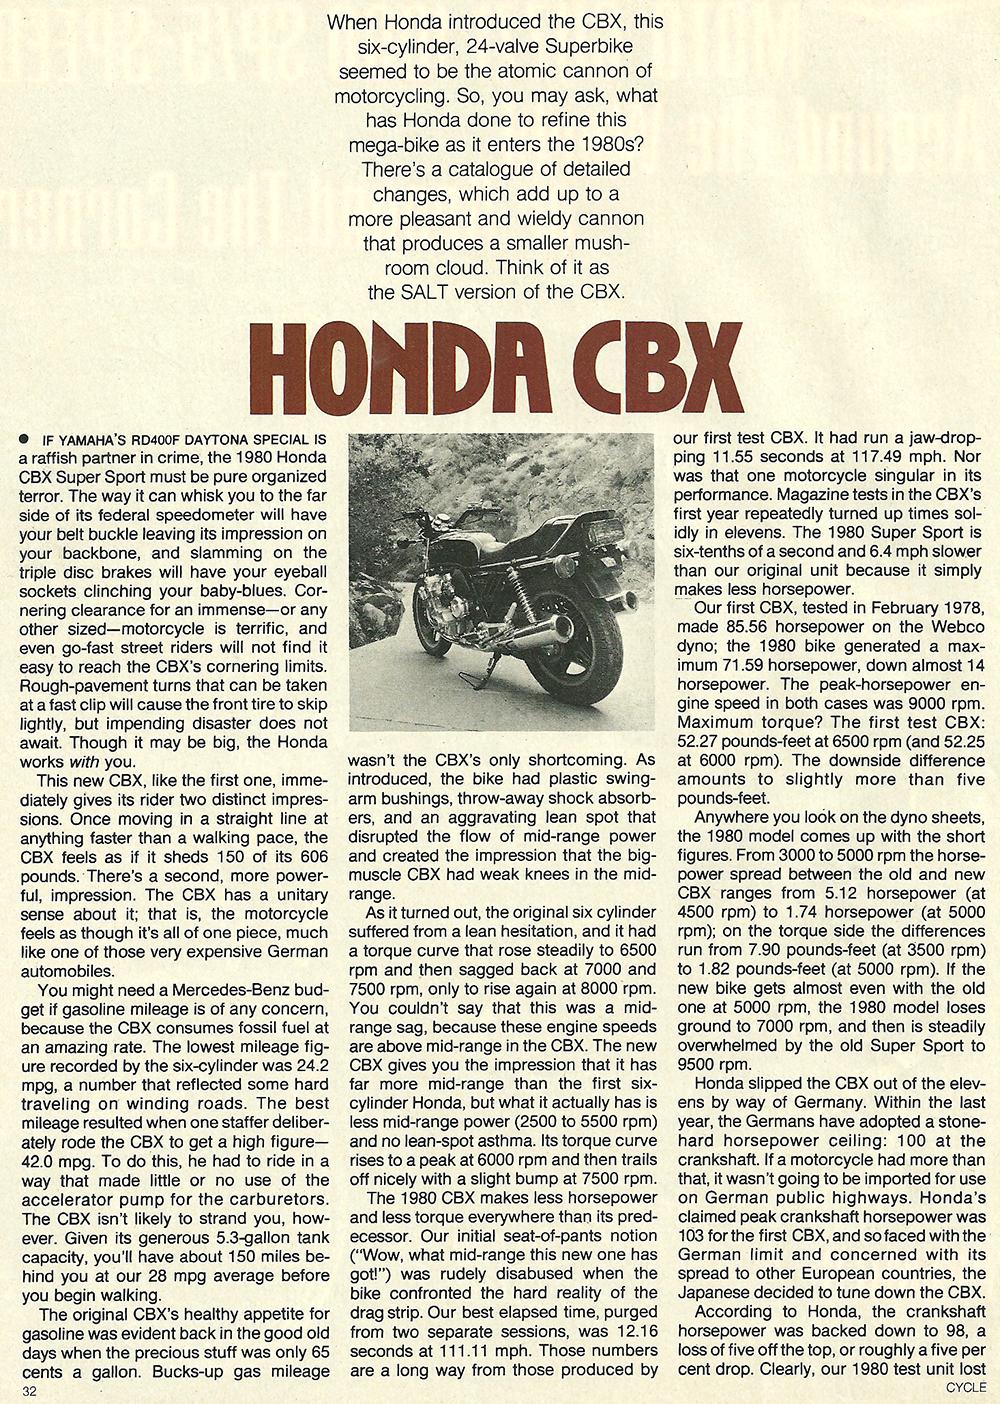 1979 Honda CBX road test 01.jpg